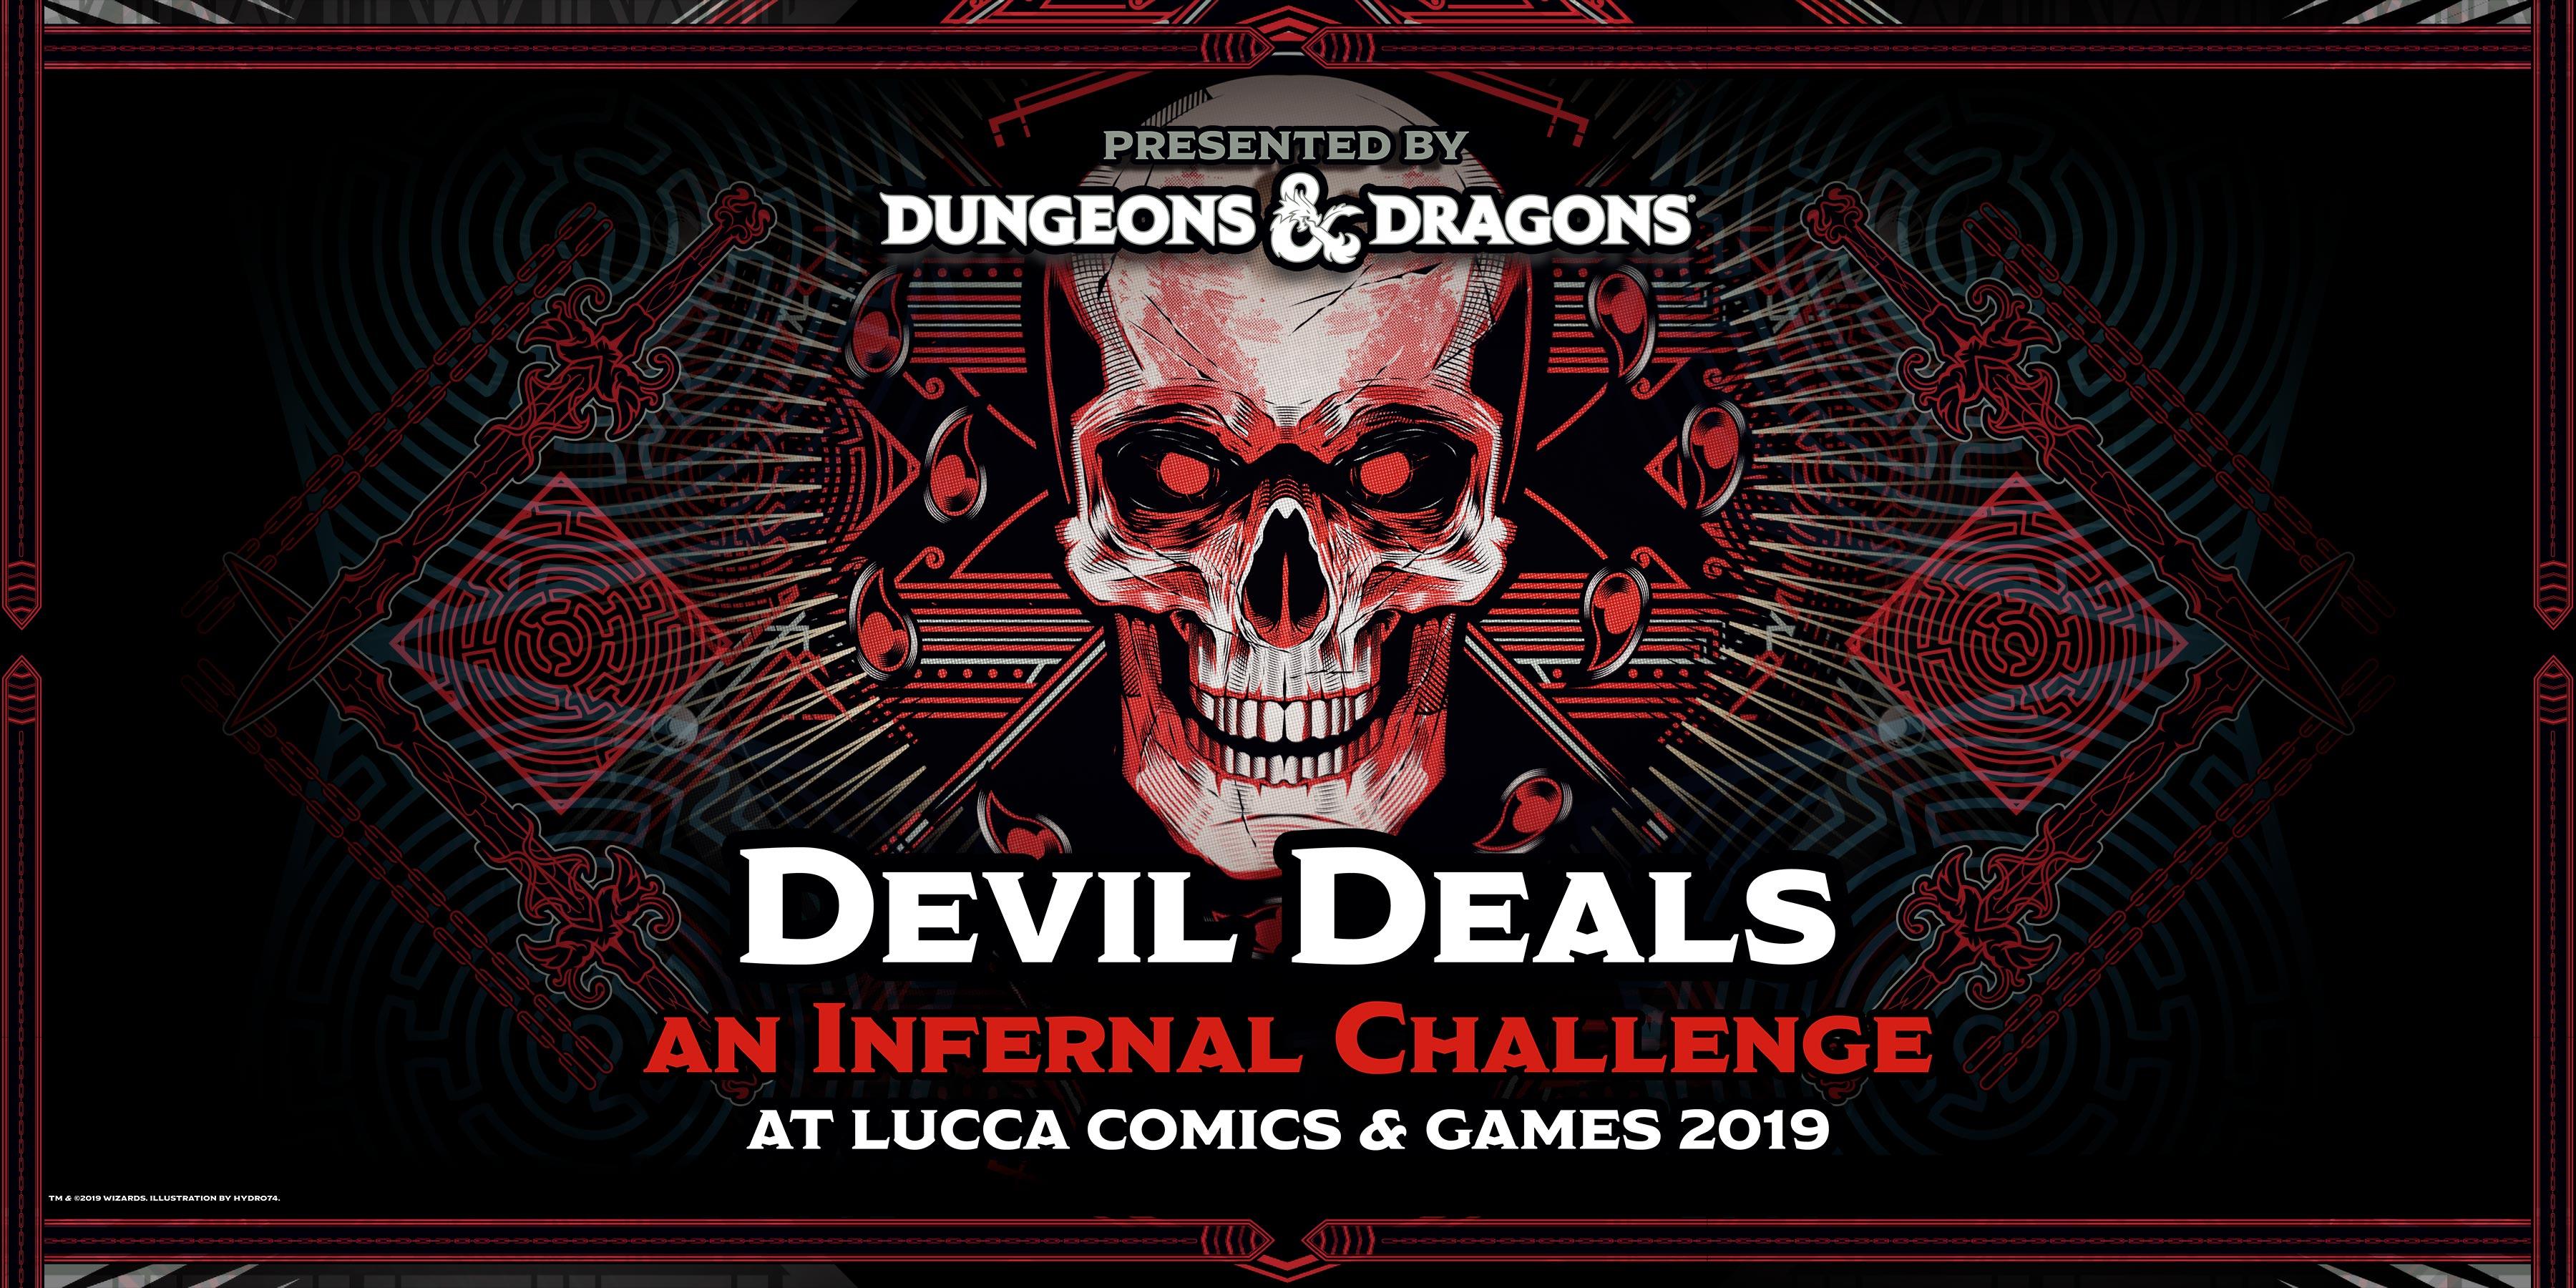 dungeons & dragons lucca comics